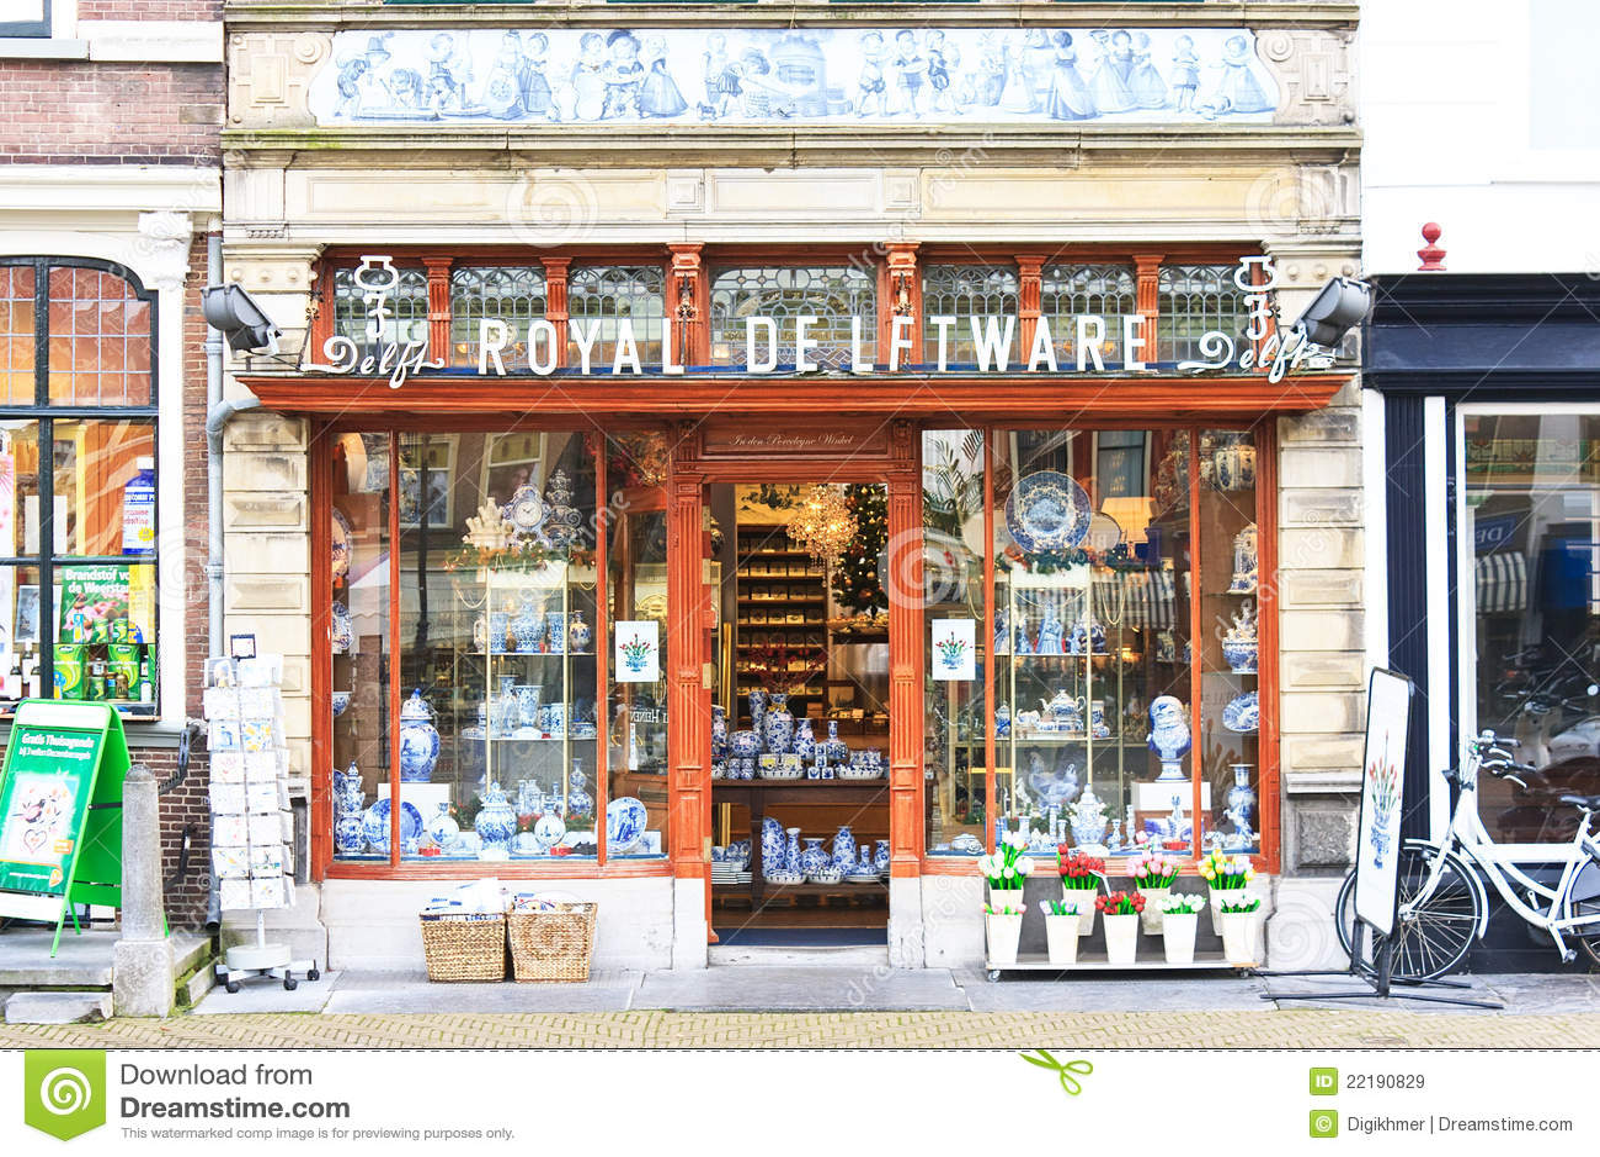 Delft Royal Delftware Editorial Stock Image Image 22190829